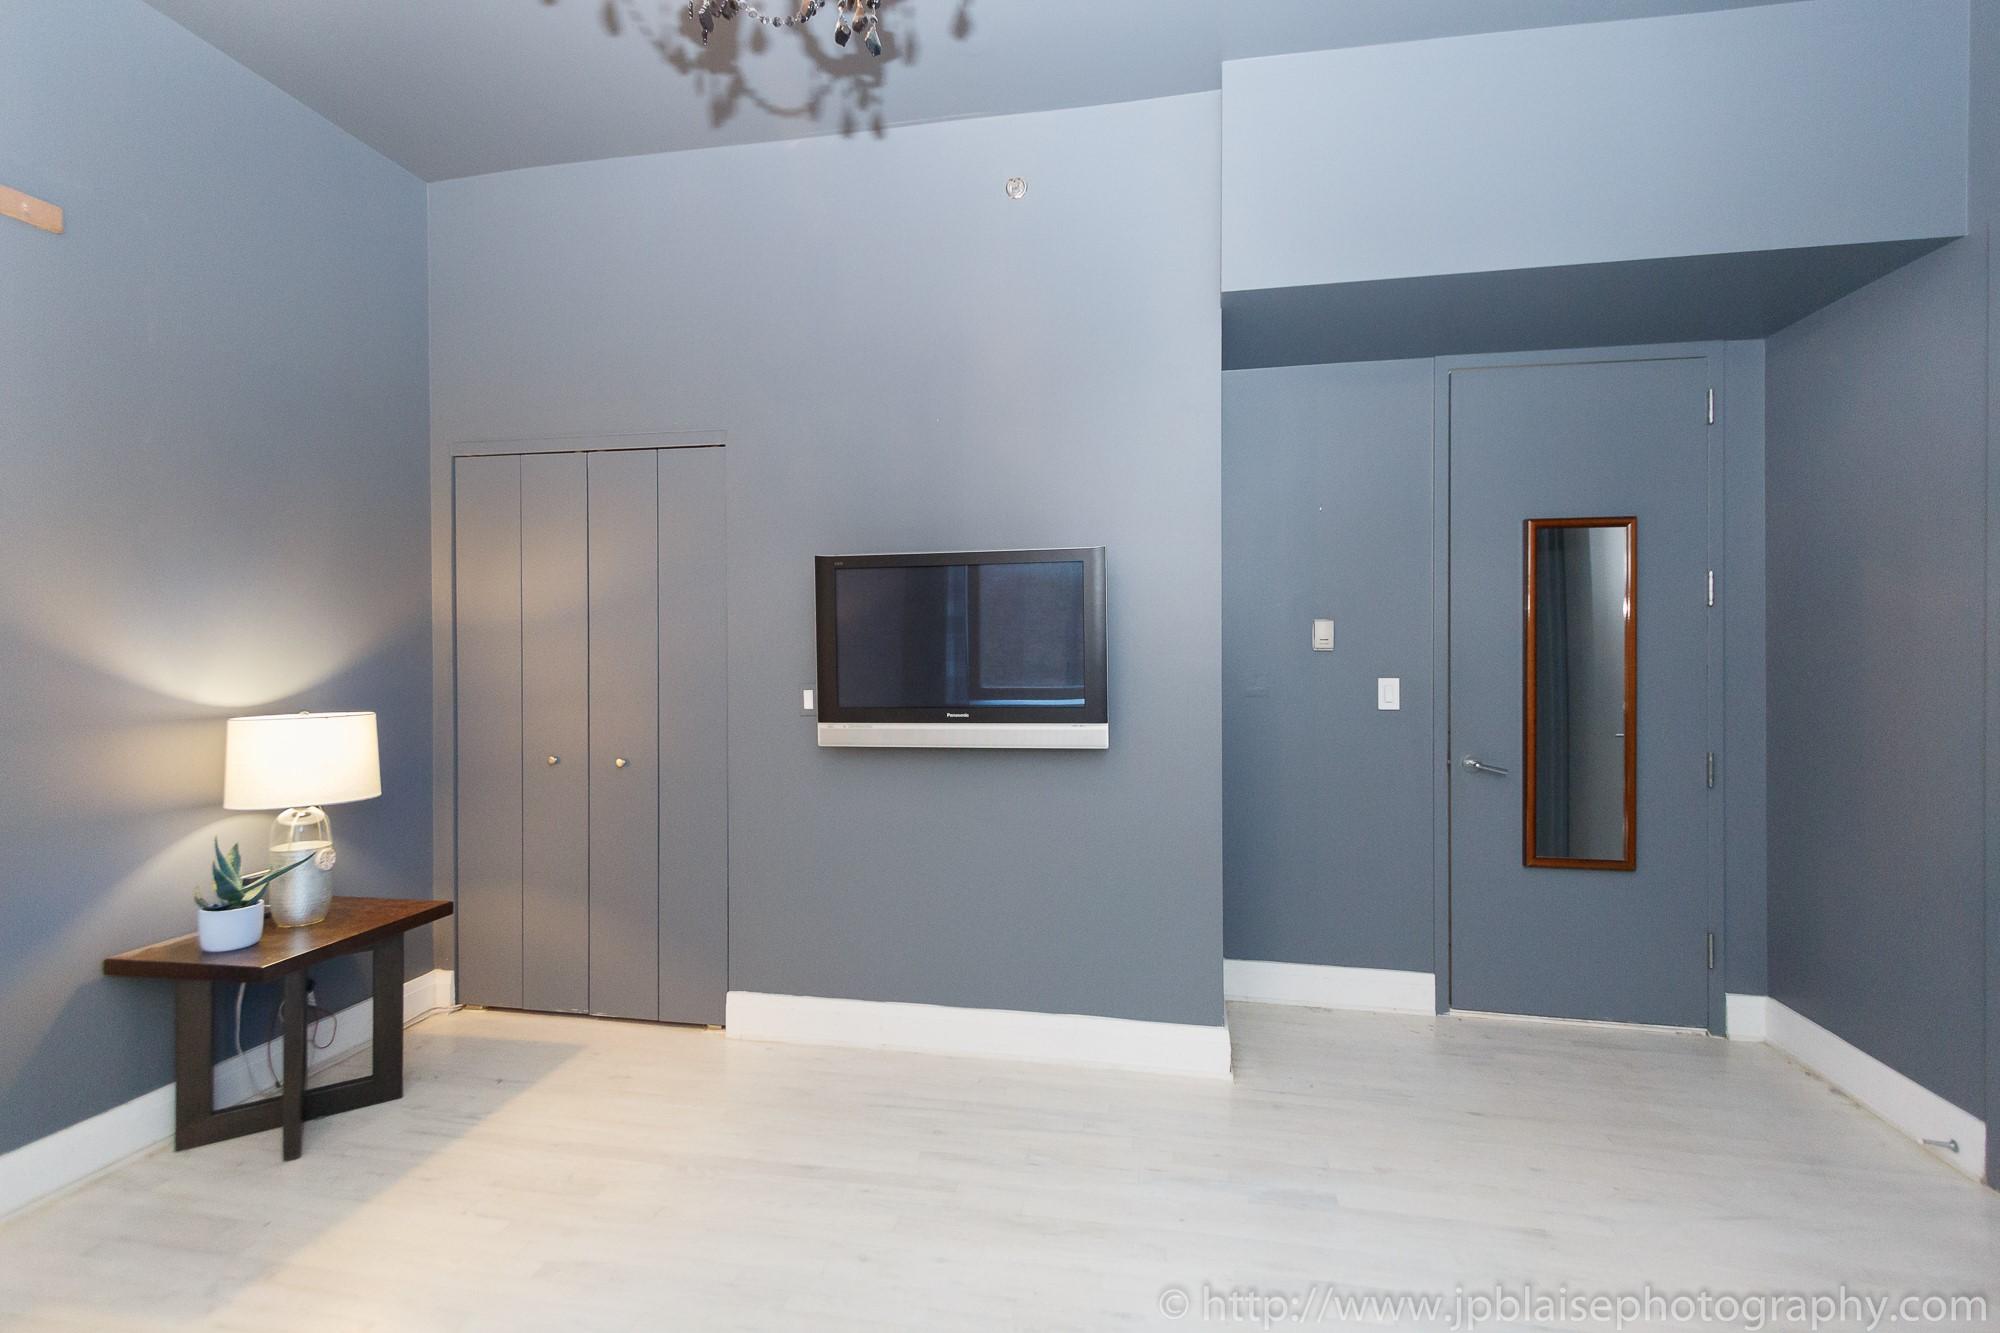 NYC apartment photographer work one bedroom condo in chelsea manhattan bedroom new york